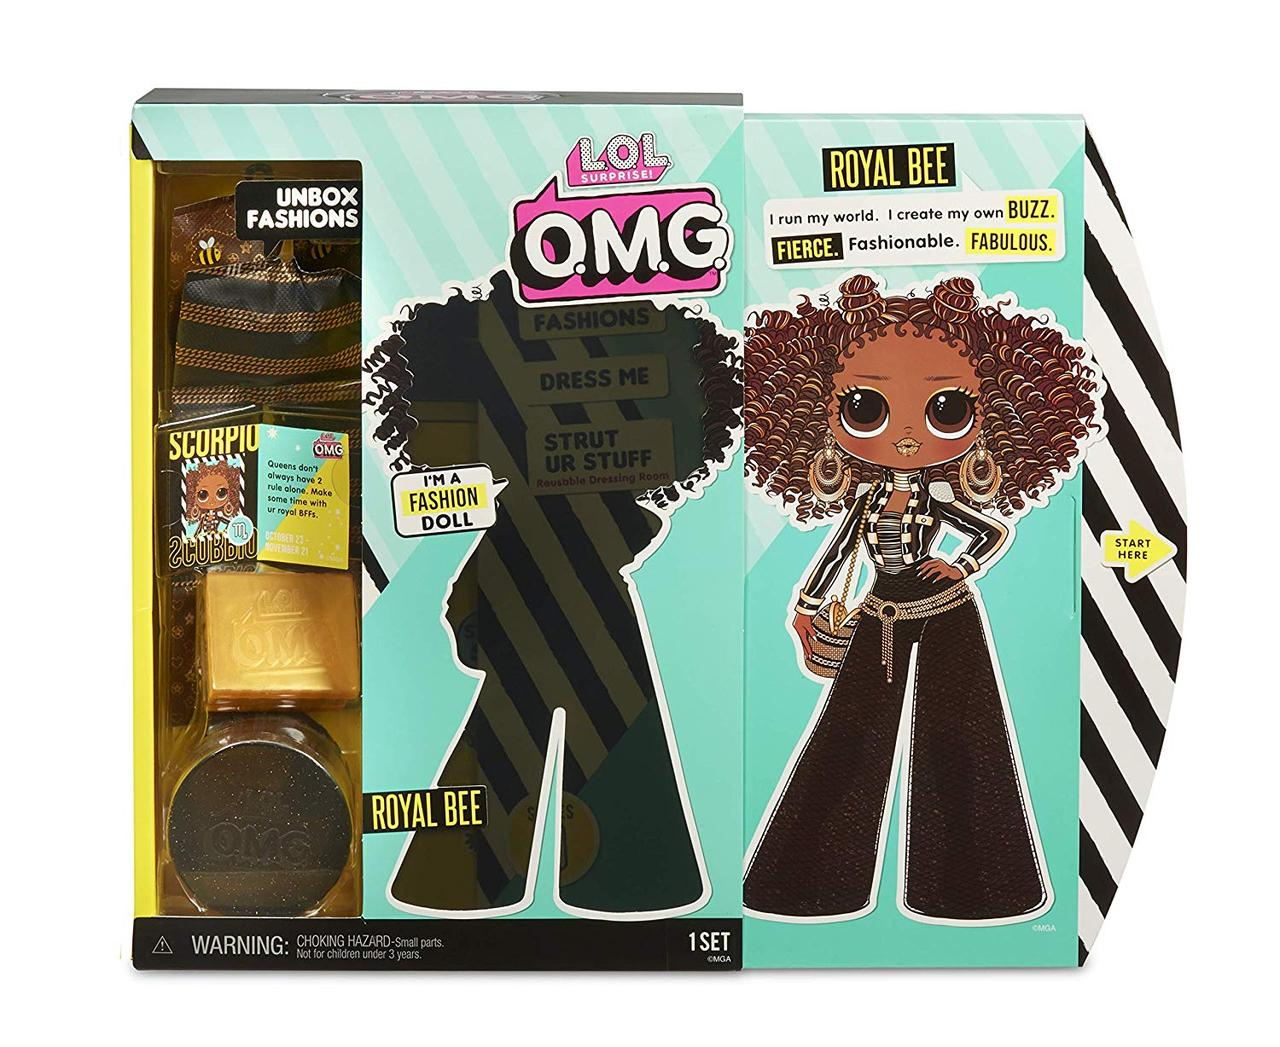 ЛОЛ O.M.G. Королева Пчелка / L.O.L. Surprise! O.M.G. Royal Bee Fashion Doll